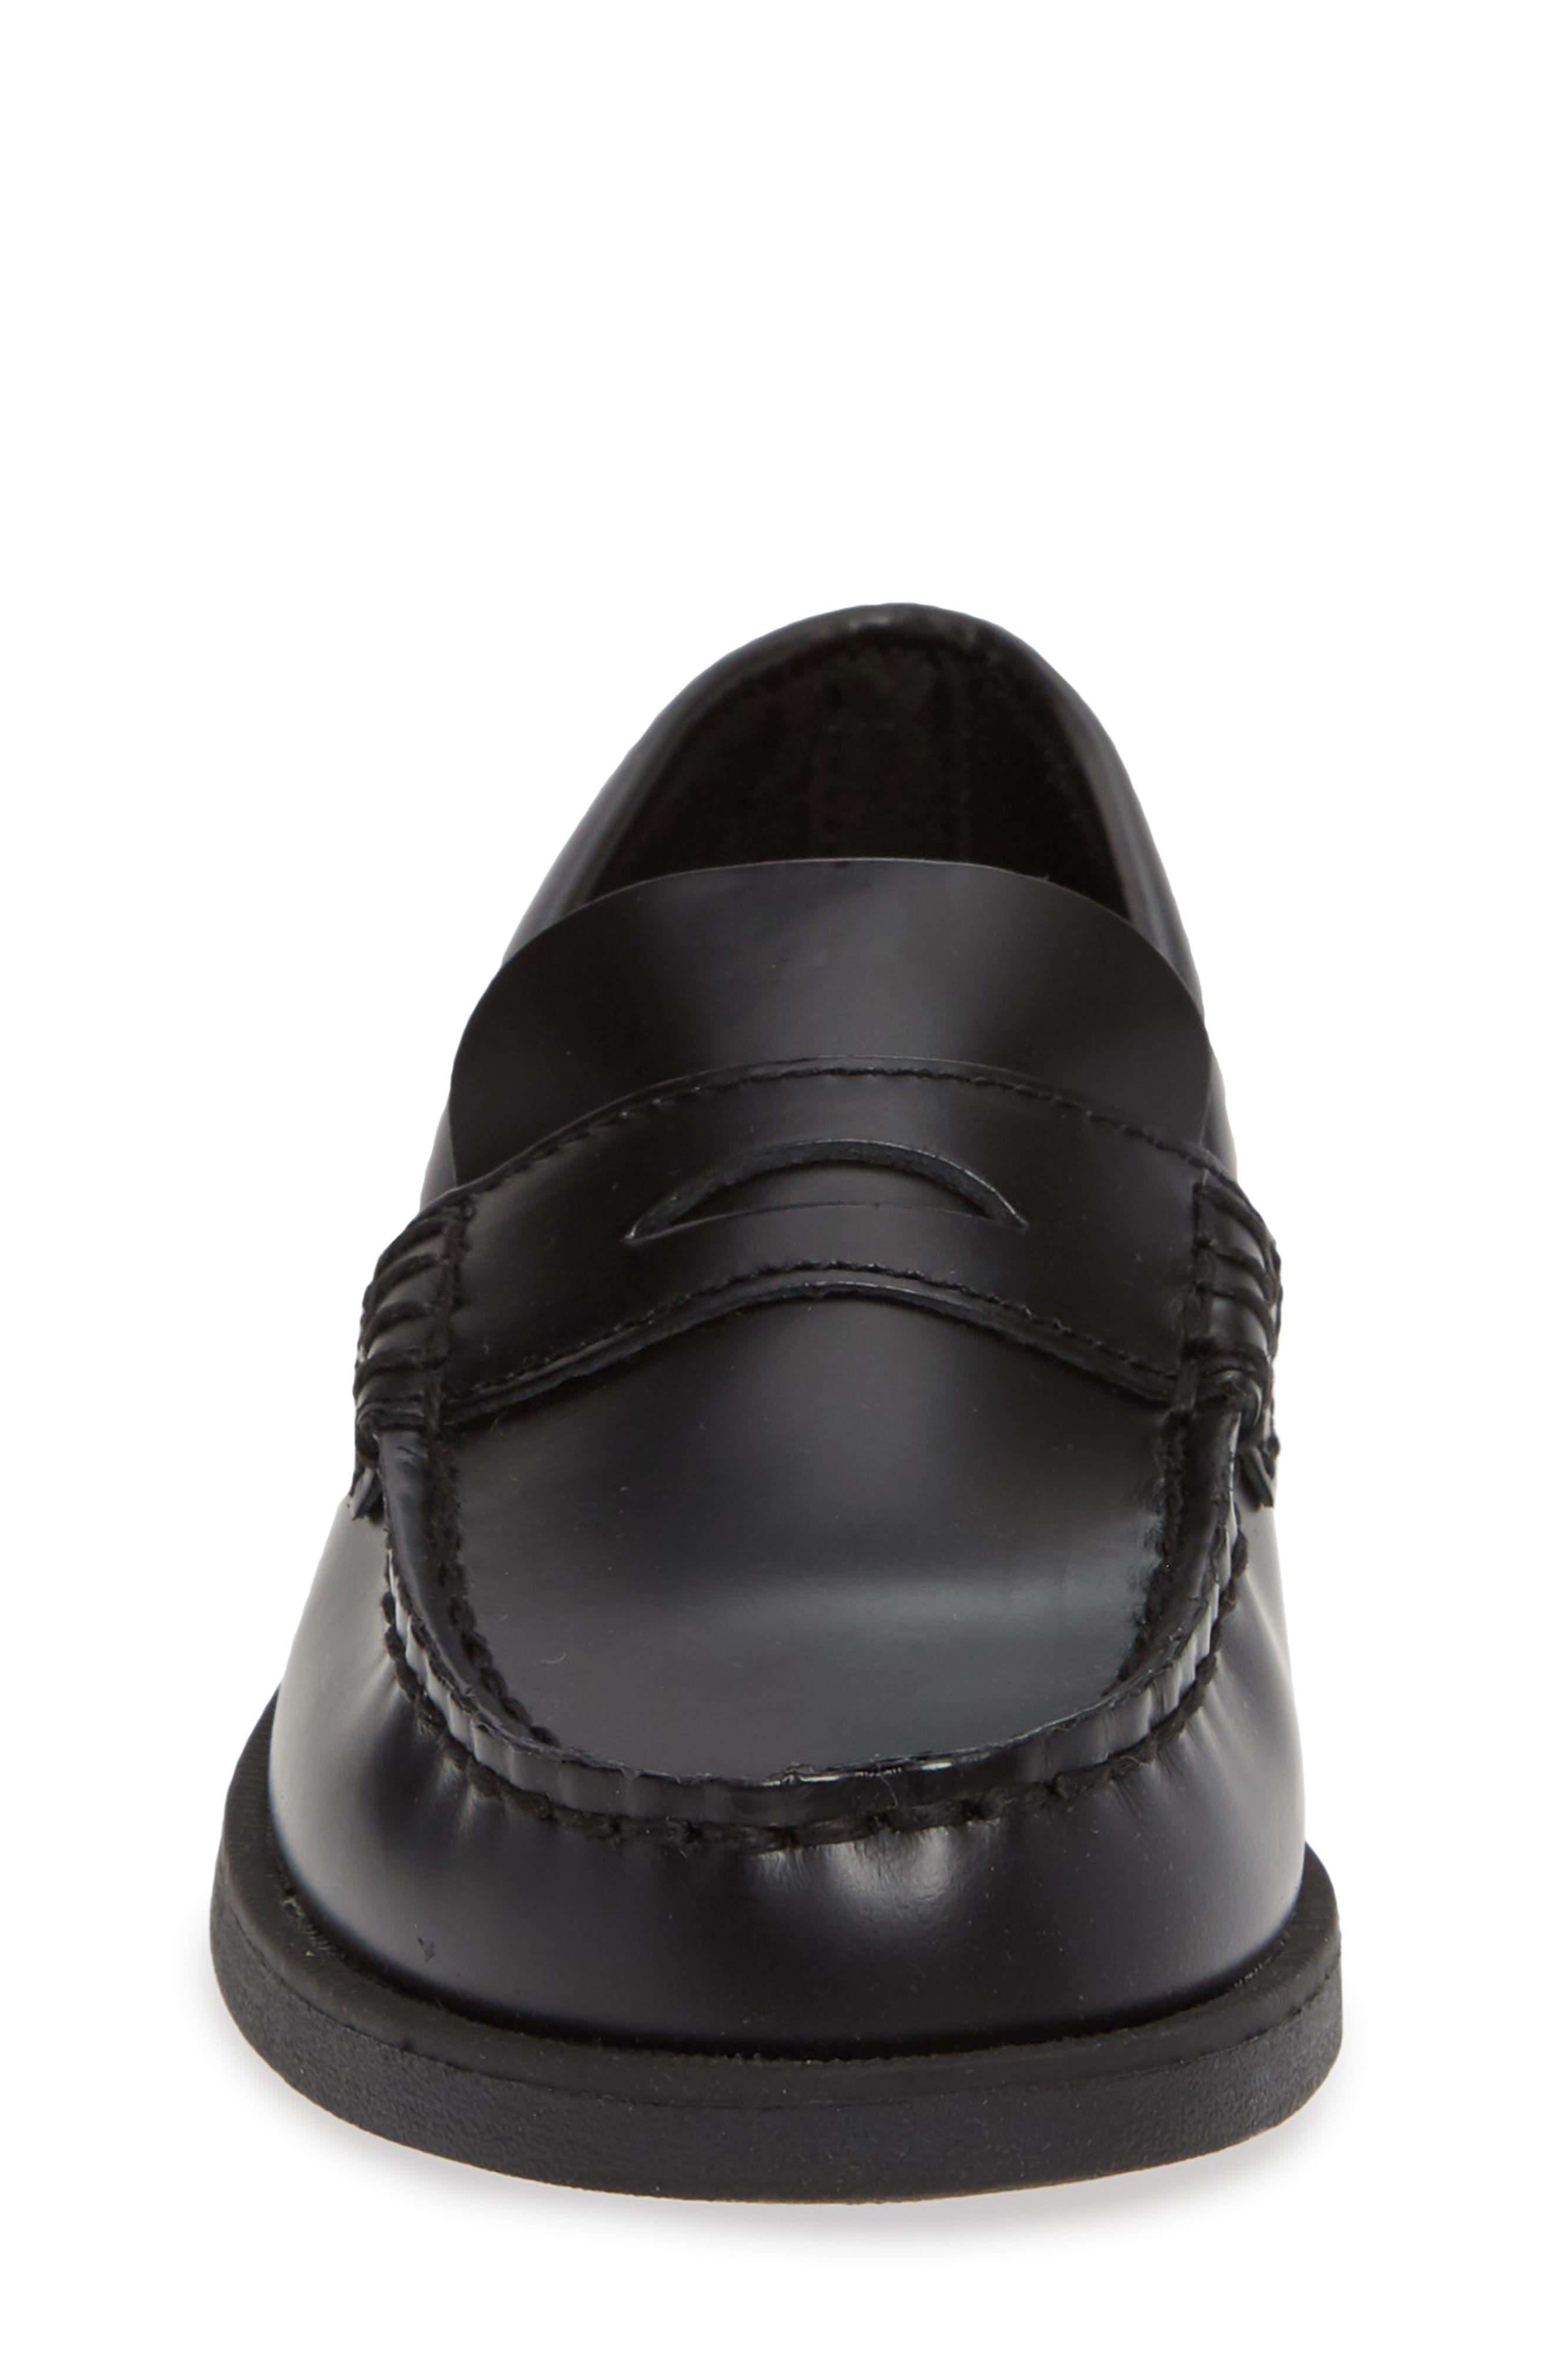 SPERRY KIDS, 'Colton' Loafer, Alternate thumbnail 5, color, BLACK LEATHER